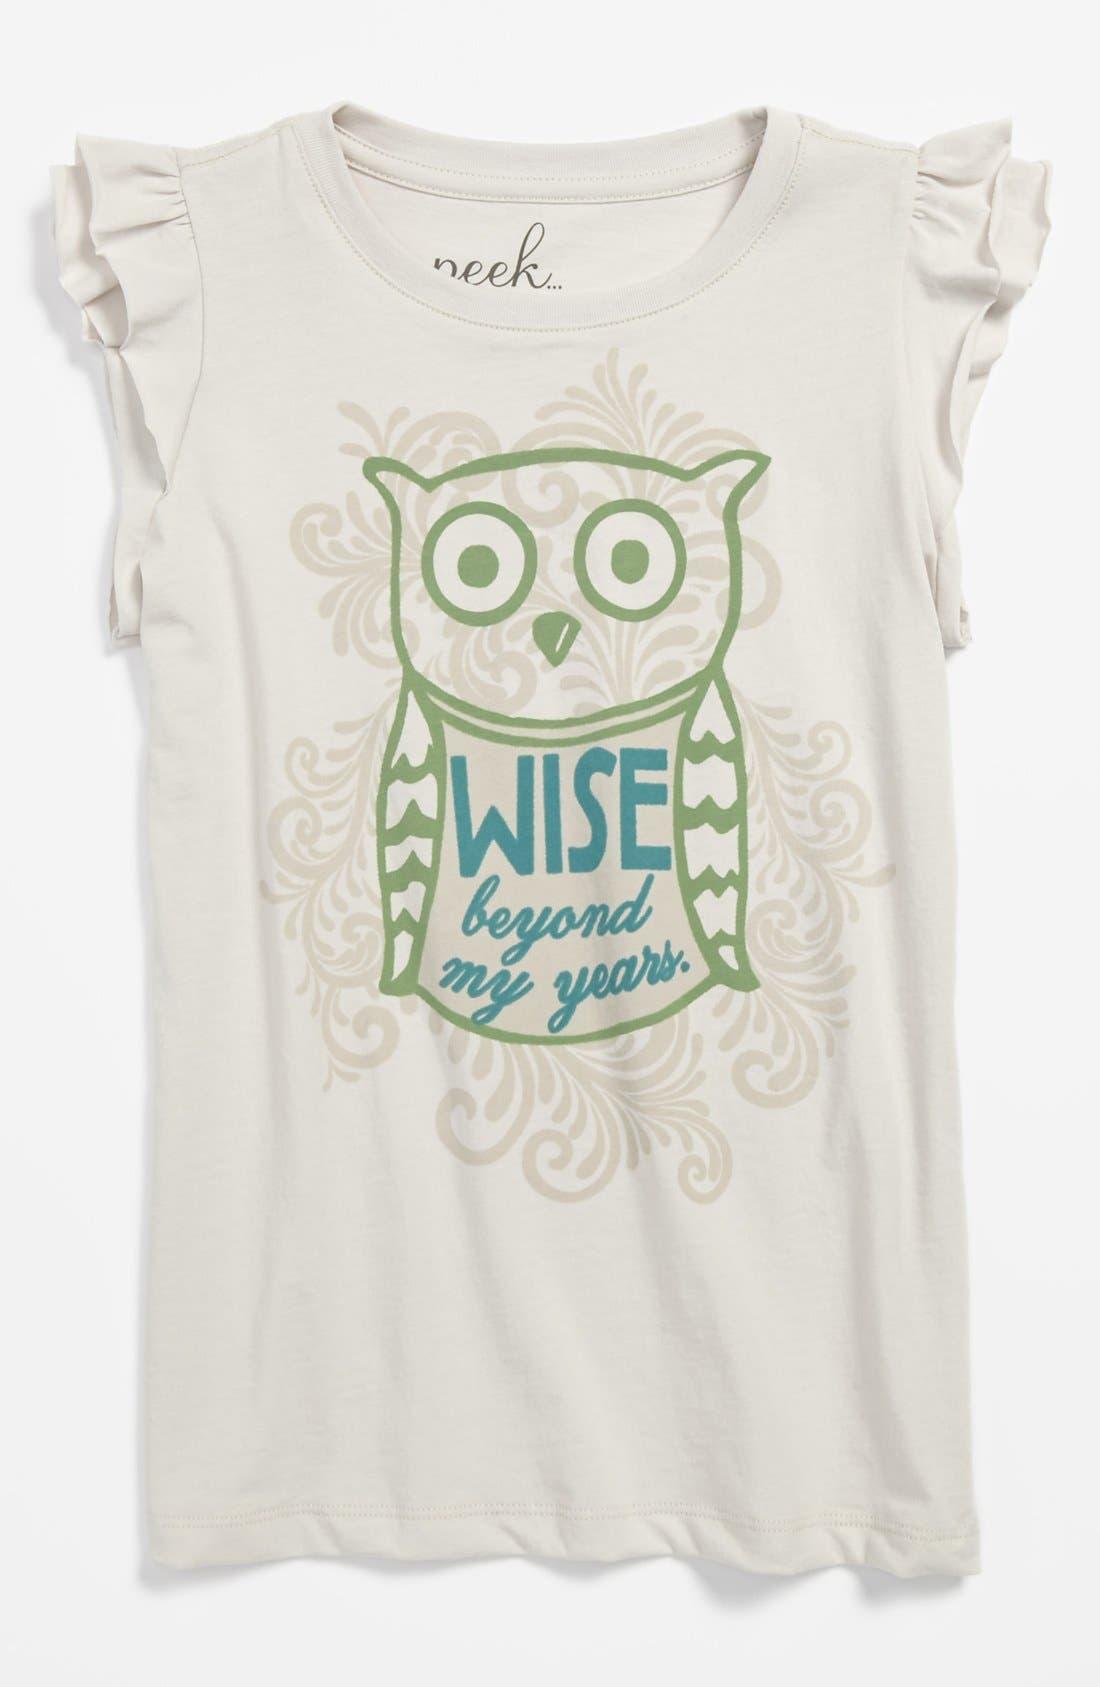 Main Image - Peek 'Be Wise' Tee (Baby Girls)